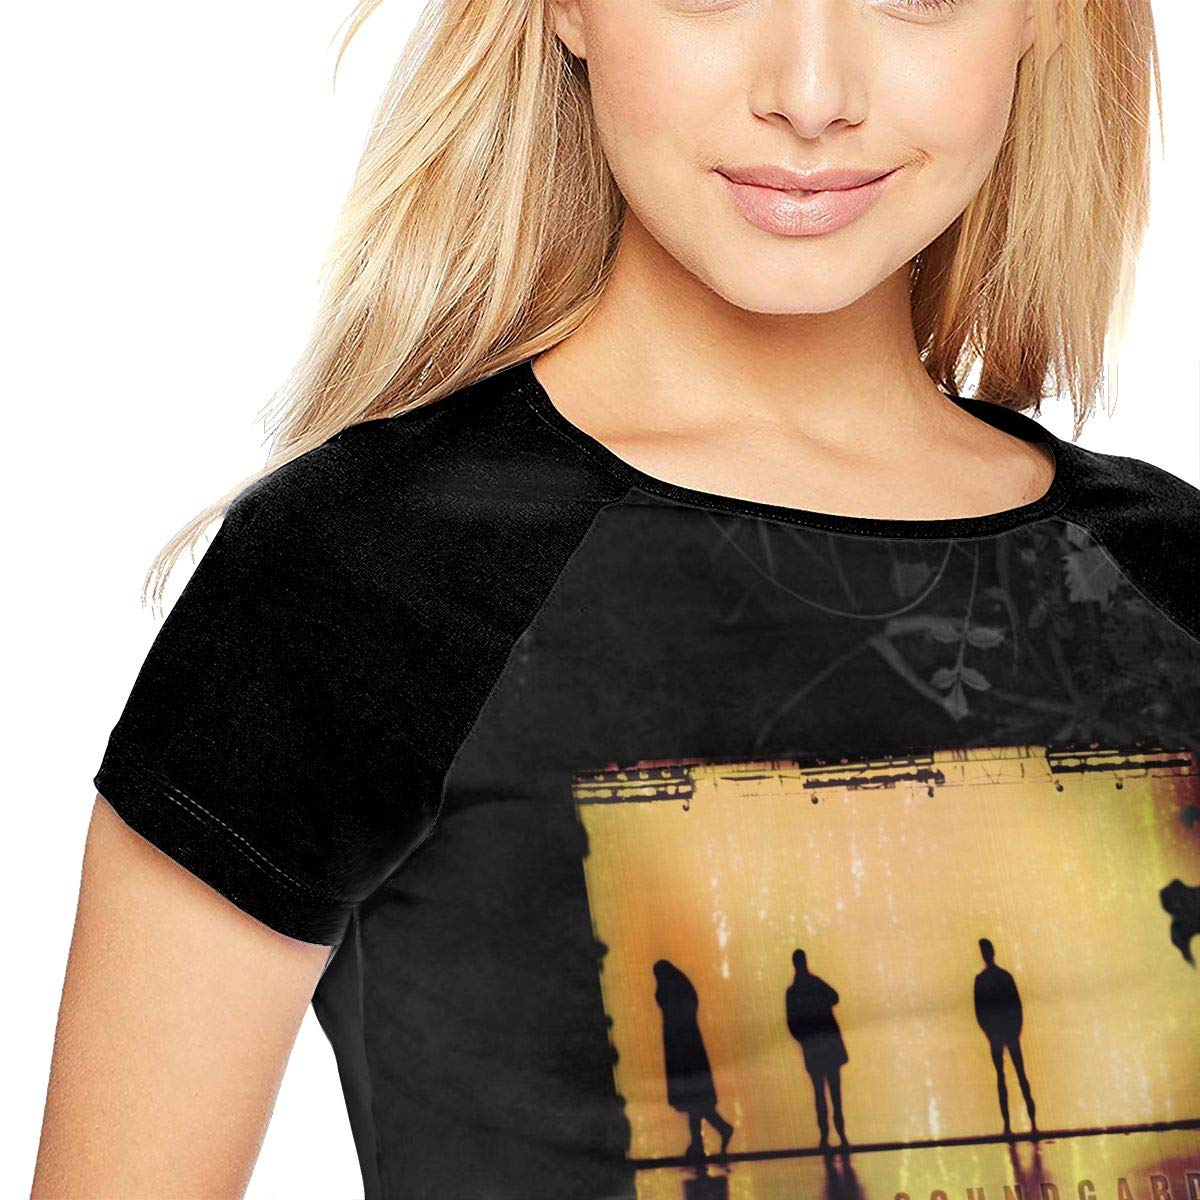 Mabb Soundgarden Down On The Upside Womens Short Sleeve Raglan Baseball Tshirt Black